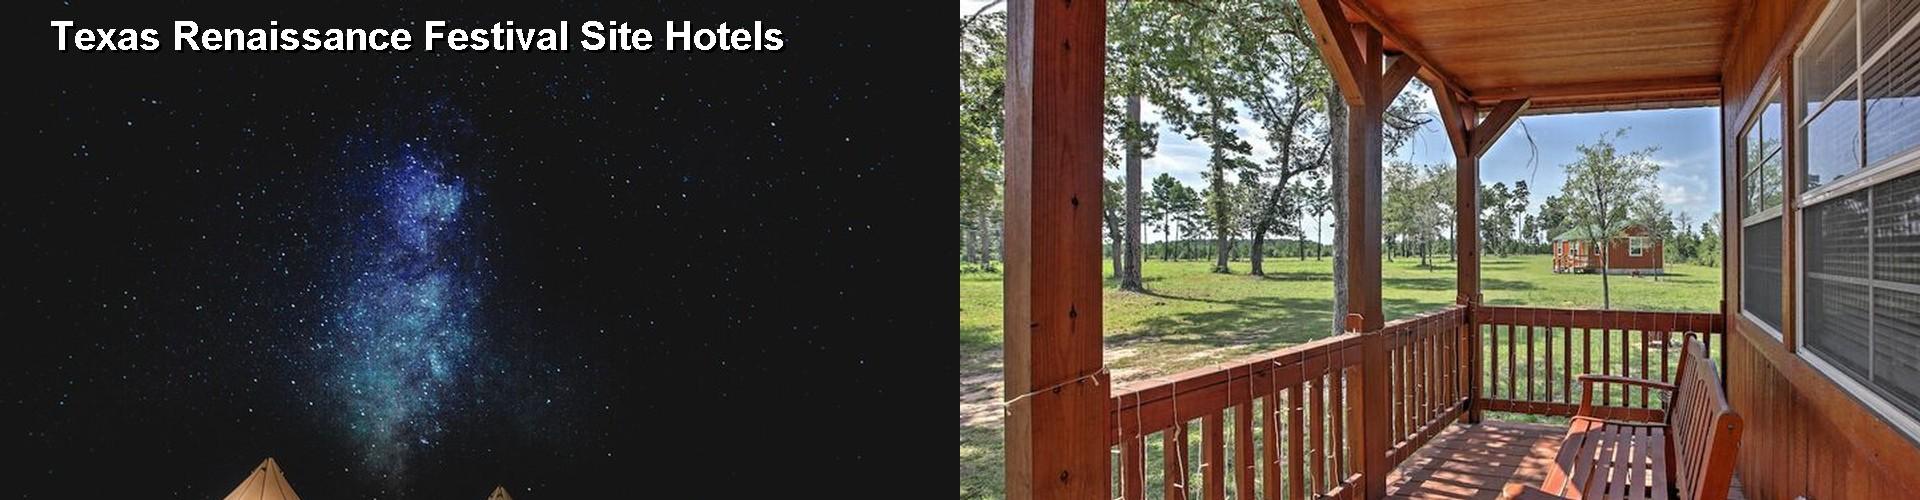 5 Best Hotels Near Texas Renaissance Festival Site